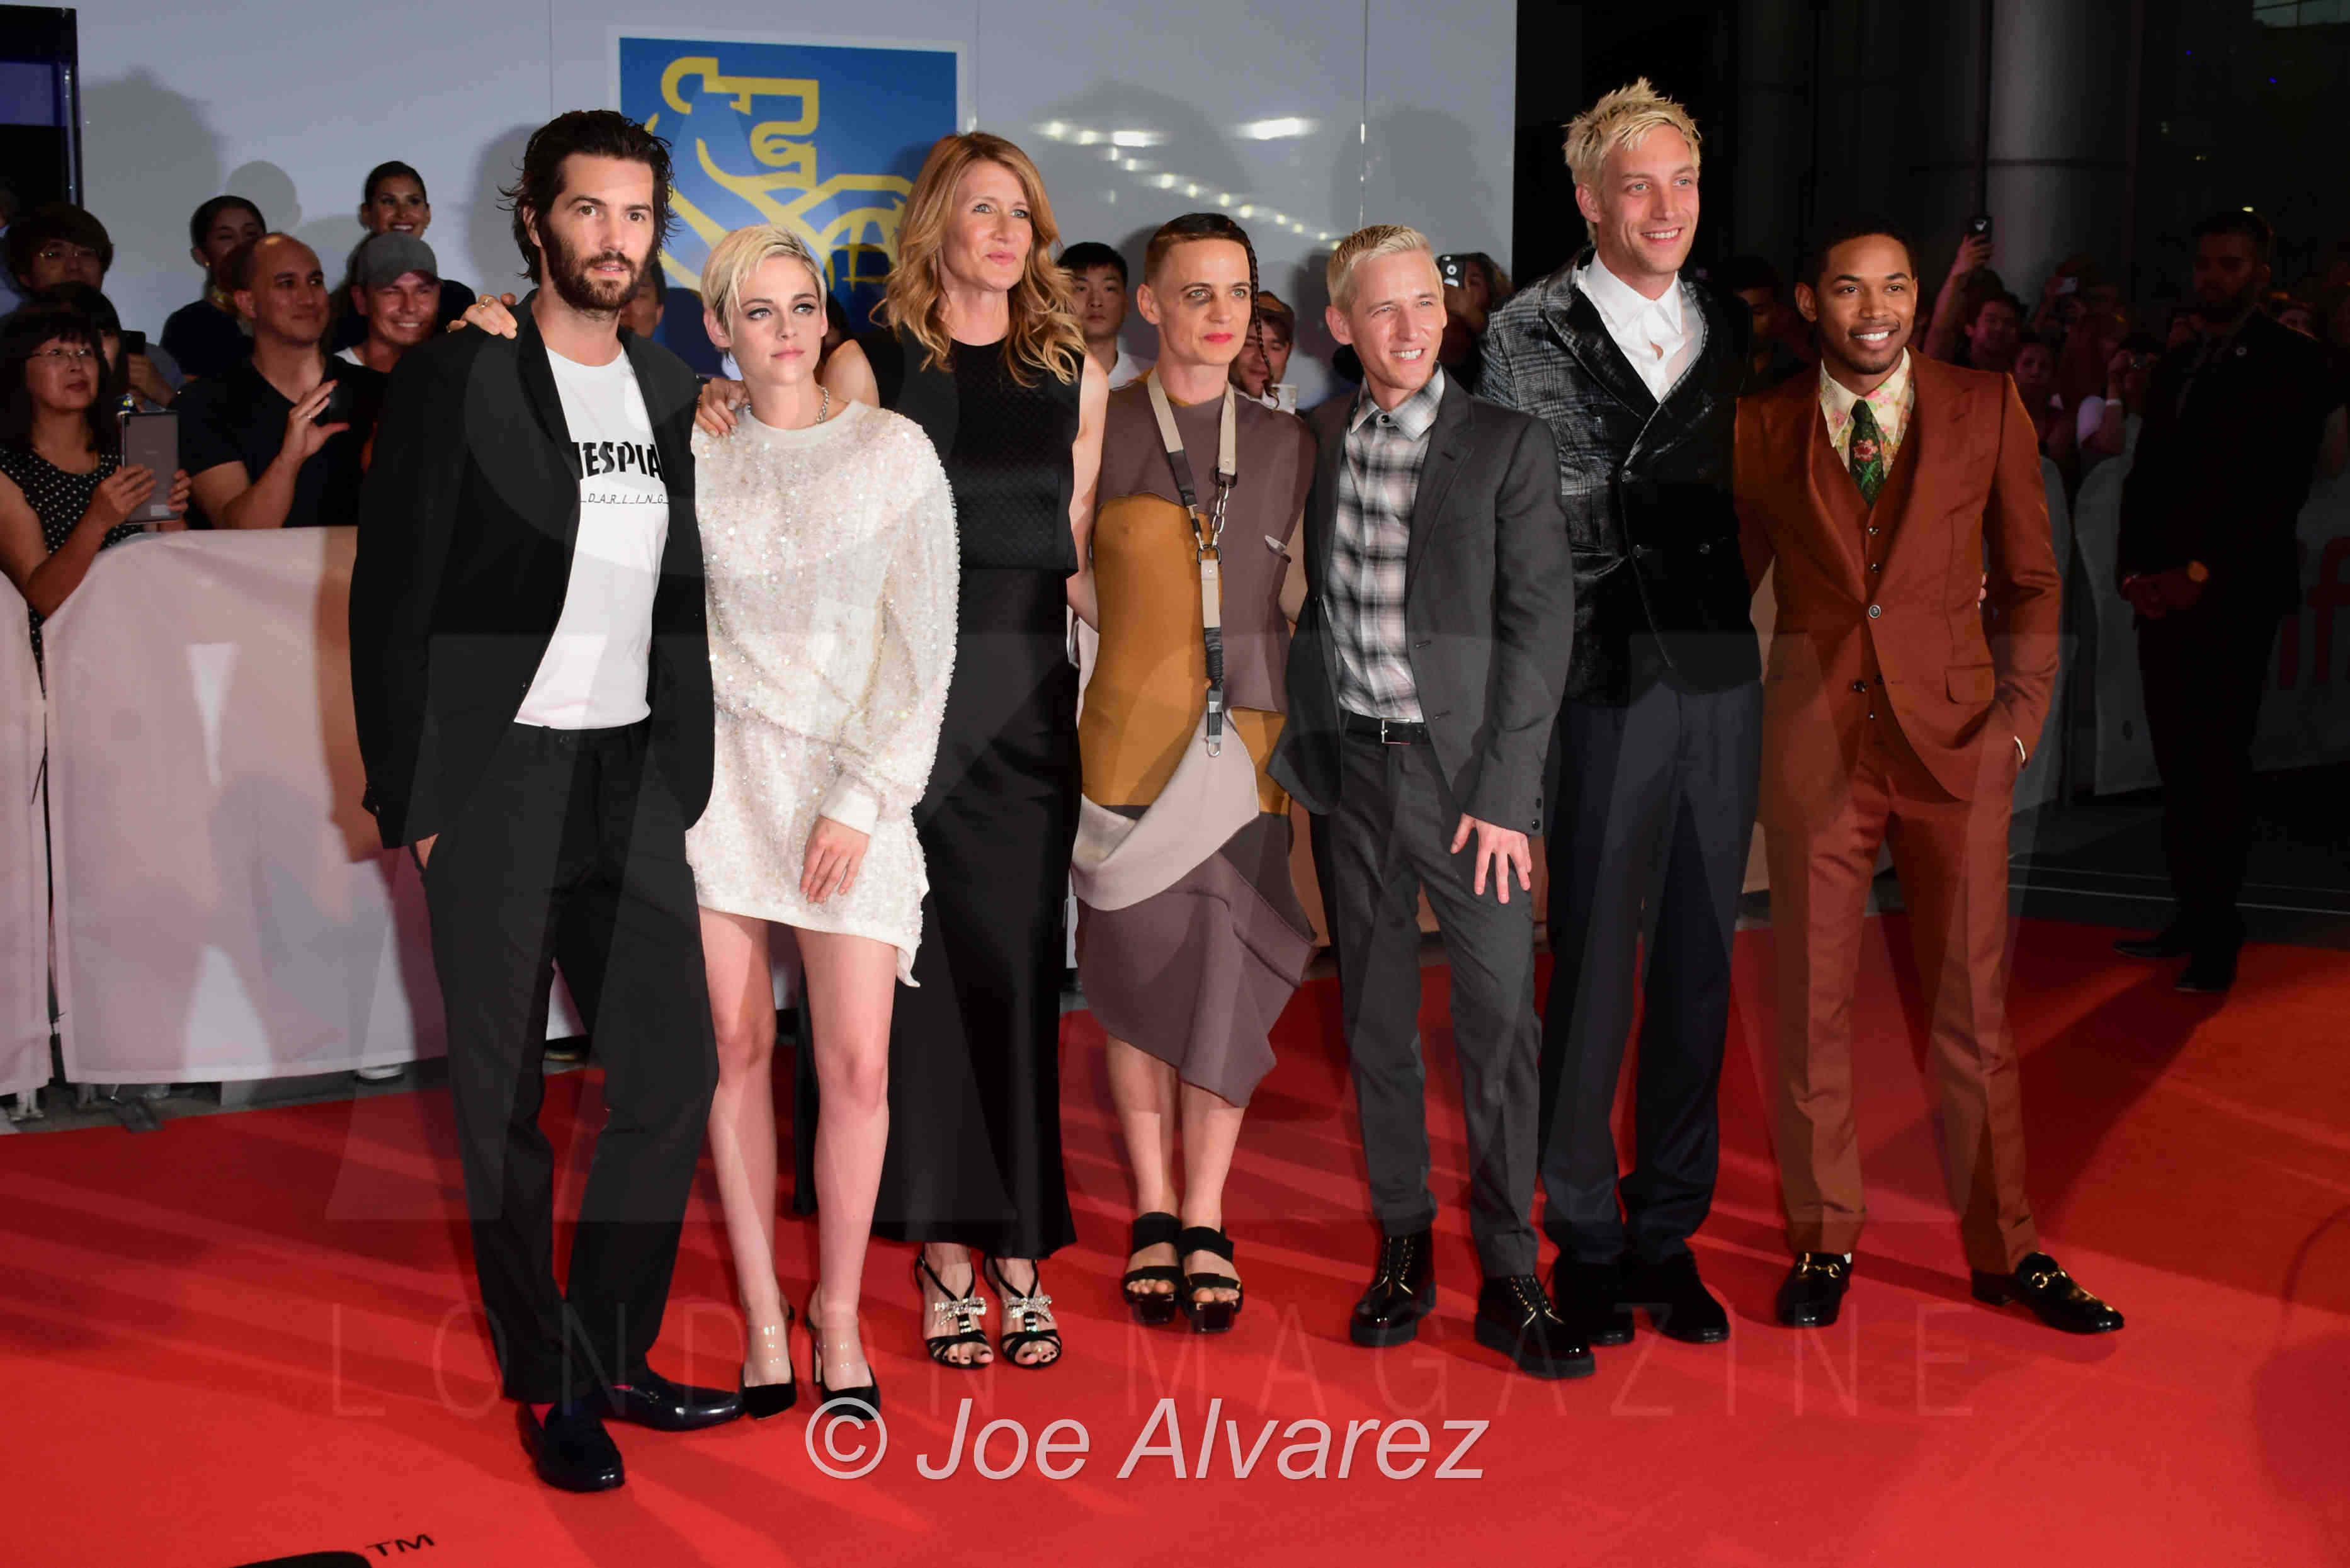 Cast of Jeremiah Terminator LeRoy © Joe Alvarez